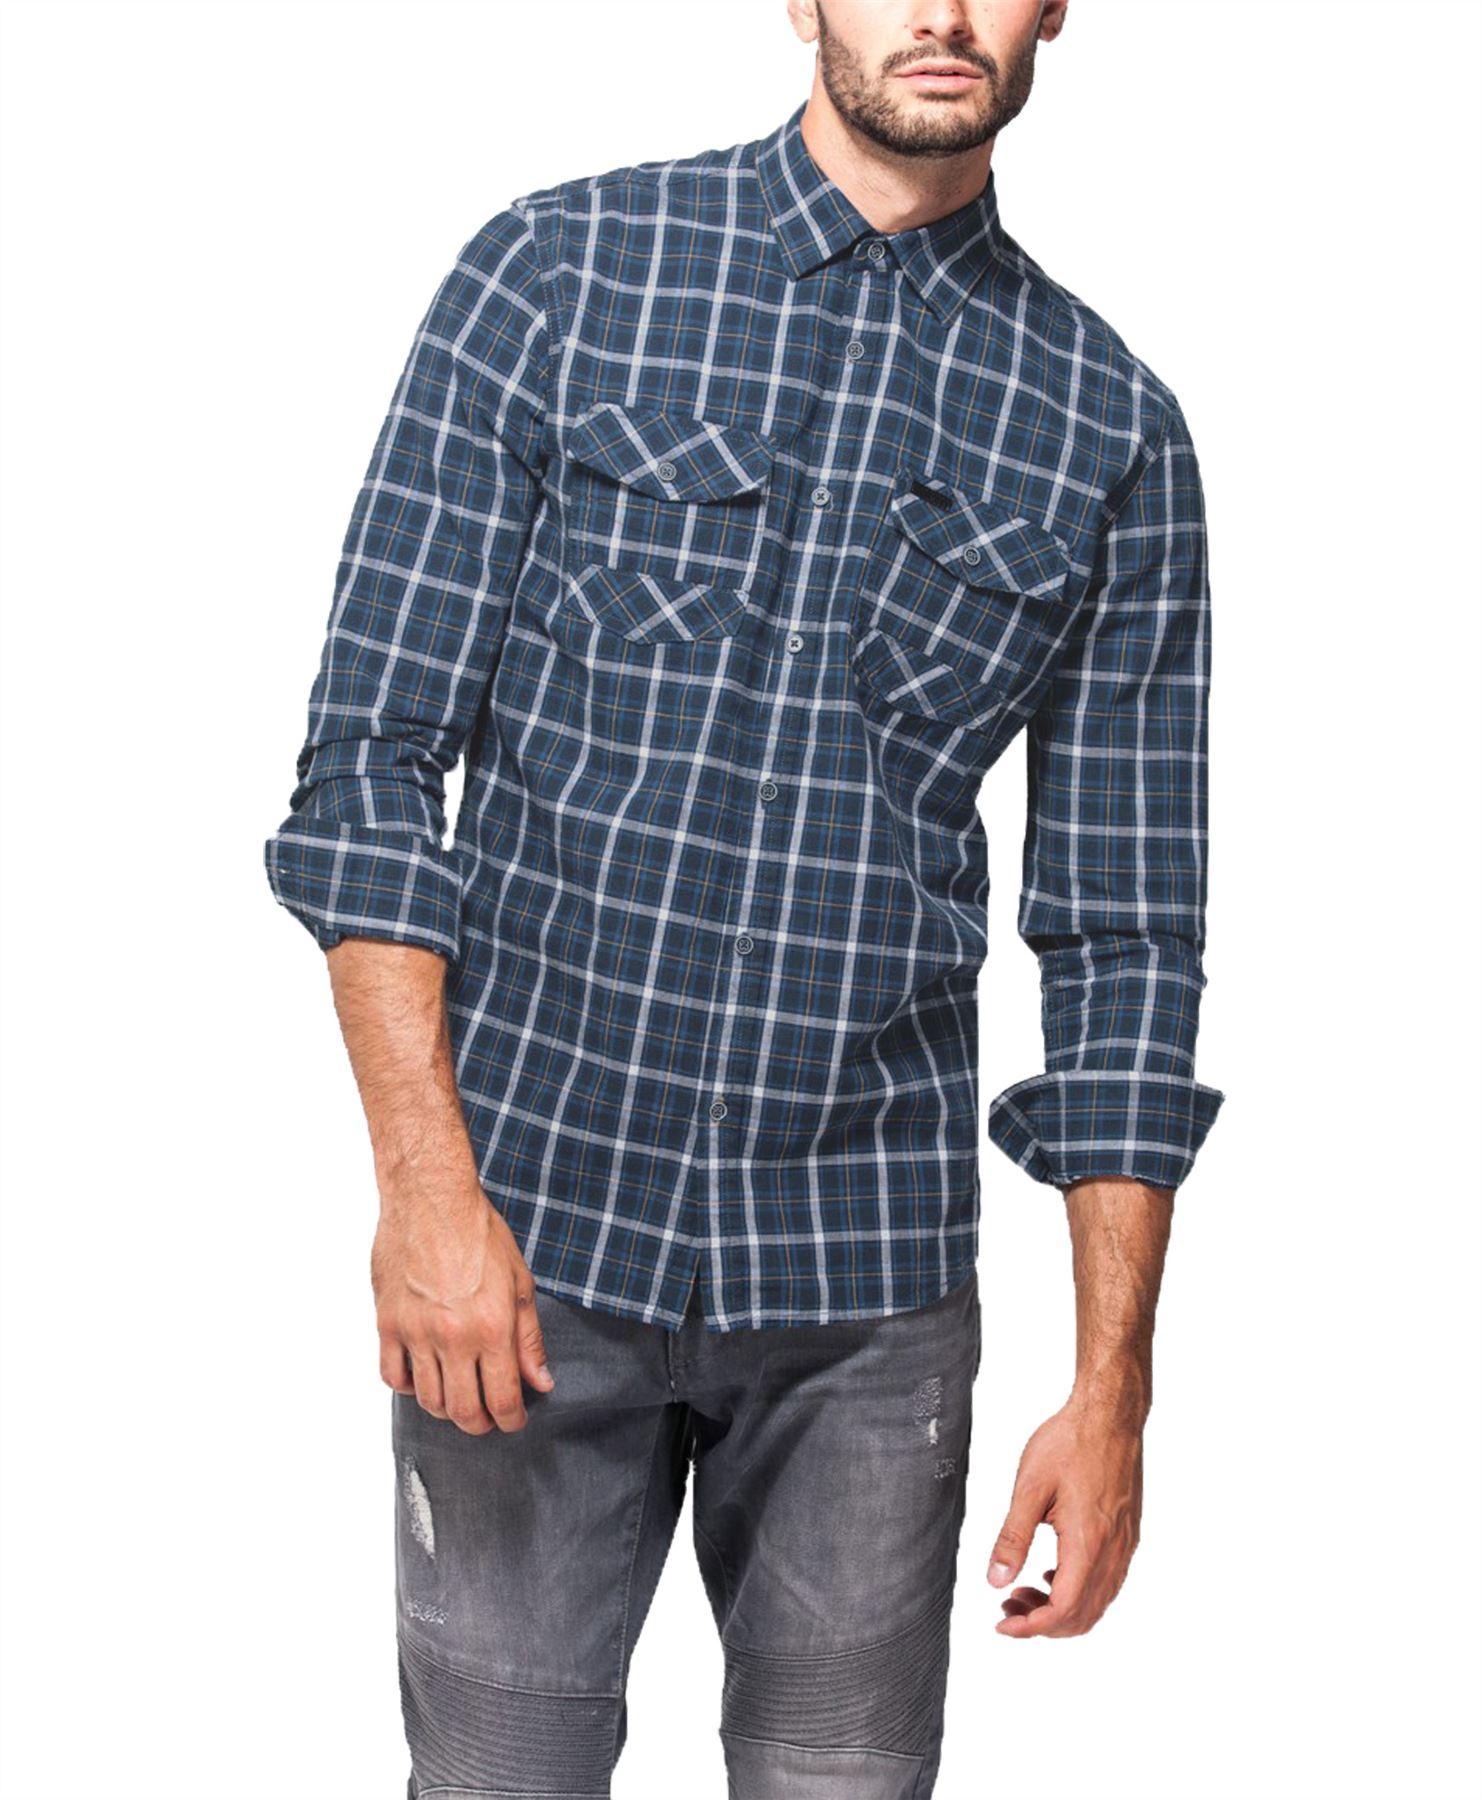 Hombre-Point-Zero-100-Algodon-Camisa-de-cuadros-manga-larga-top-casual-Talla